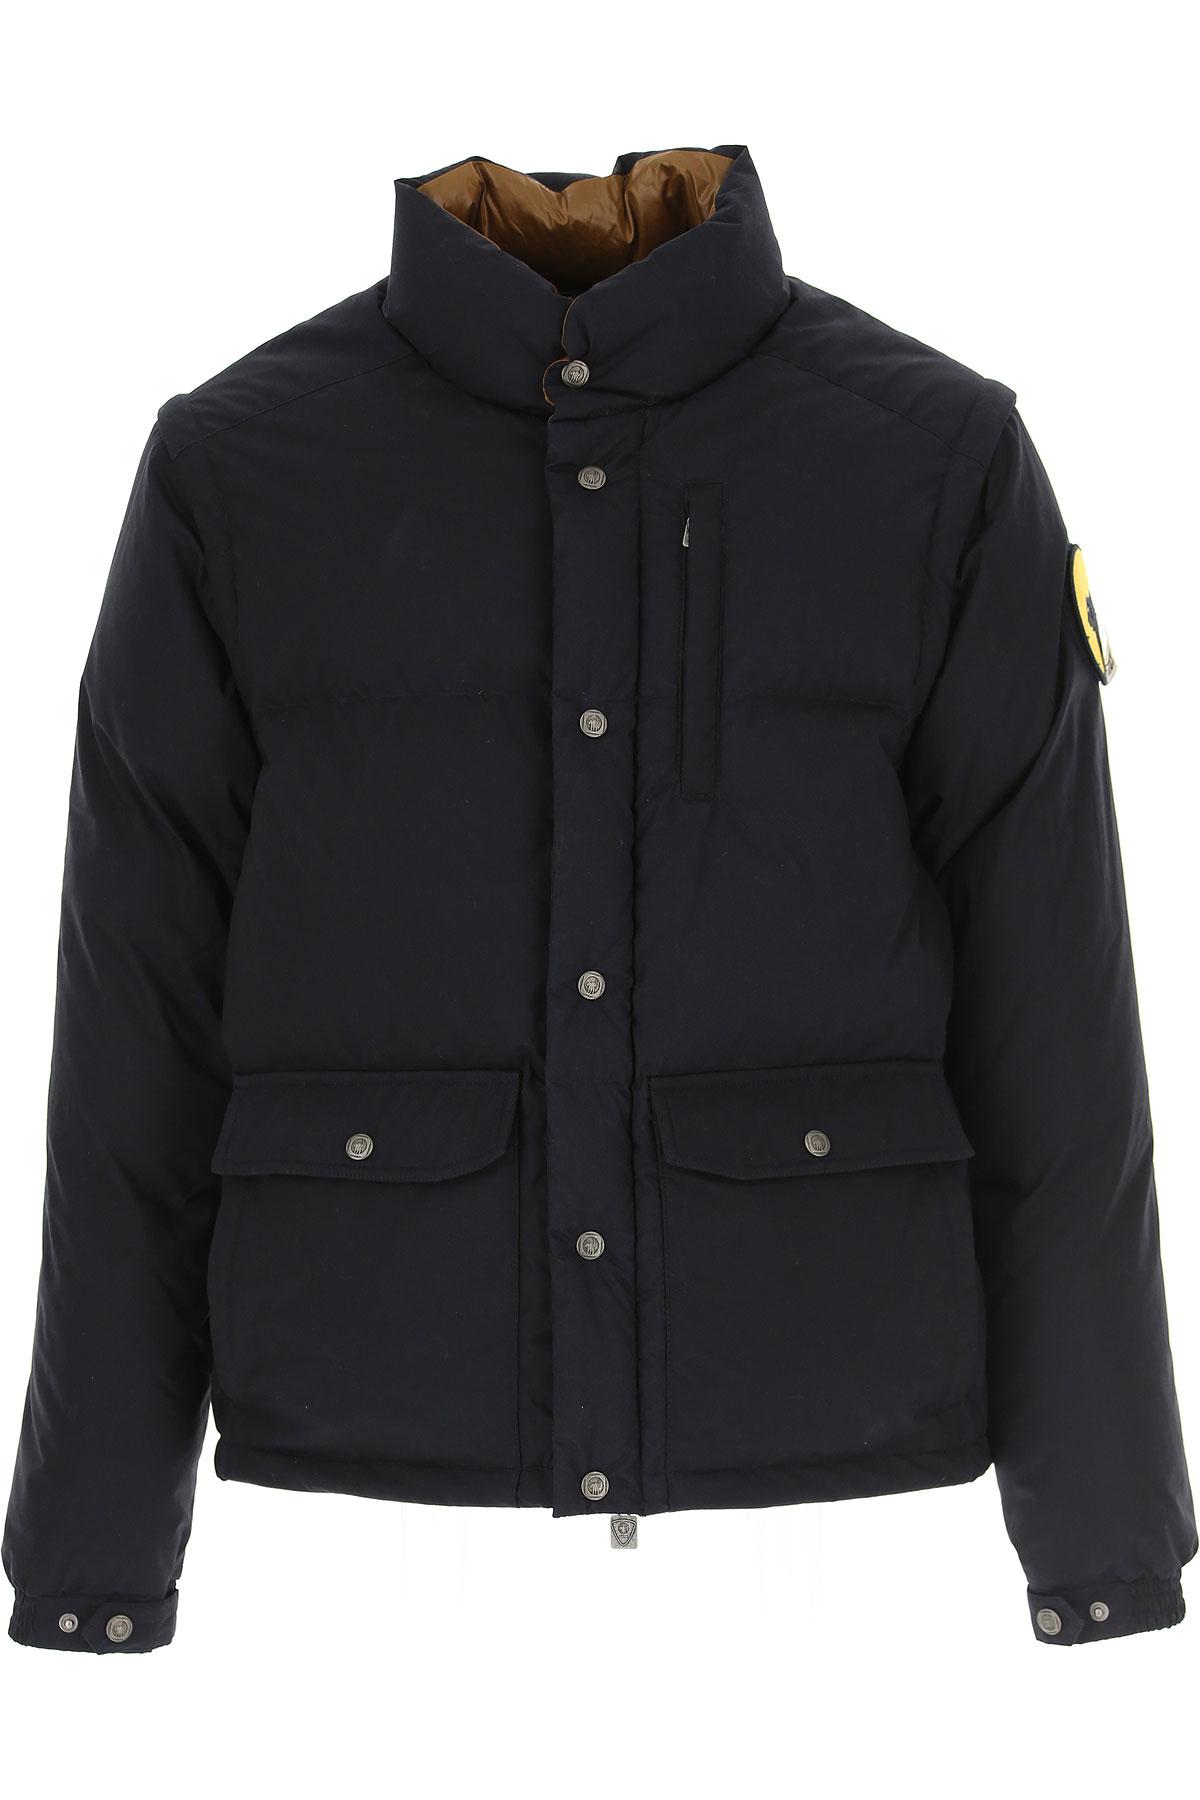 Ciesse Piumini Down Jacket for Men, Puffer Ski Jacket On Sale, Ink, Cotton, 2019, L XL